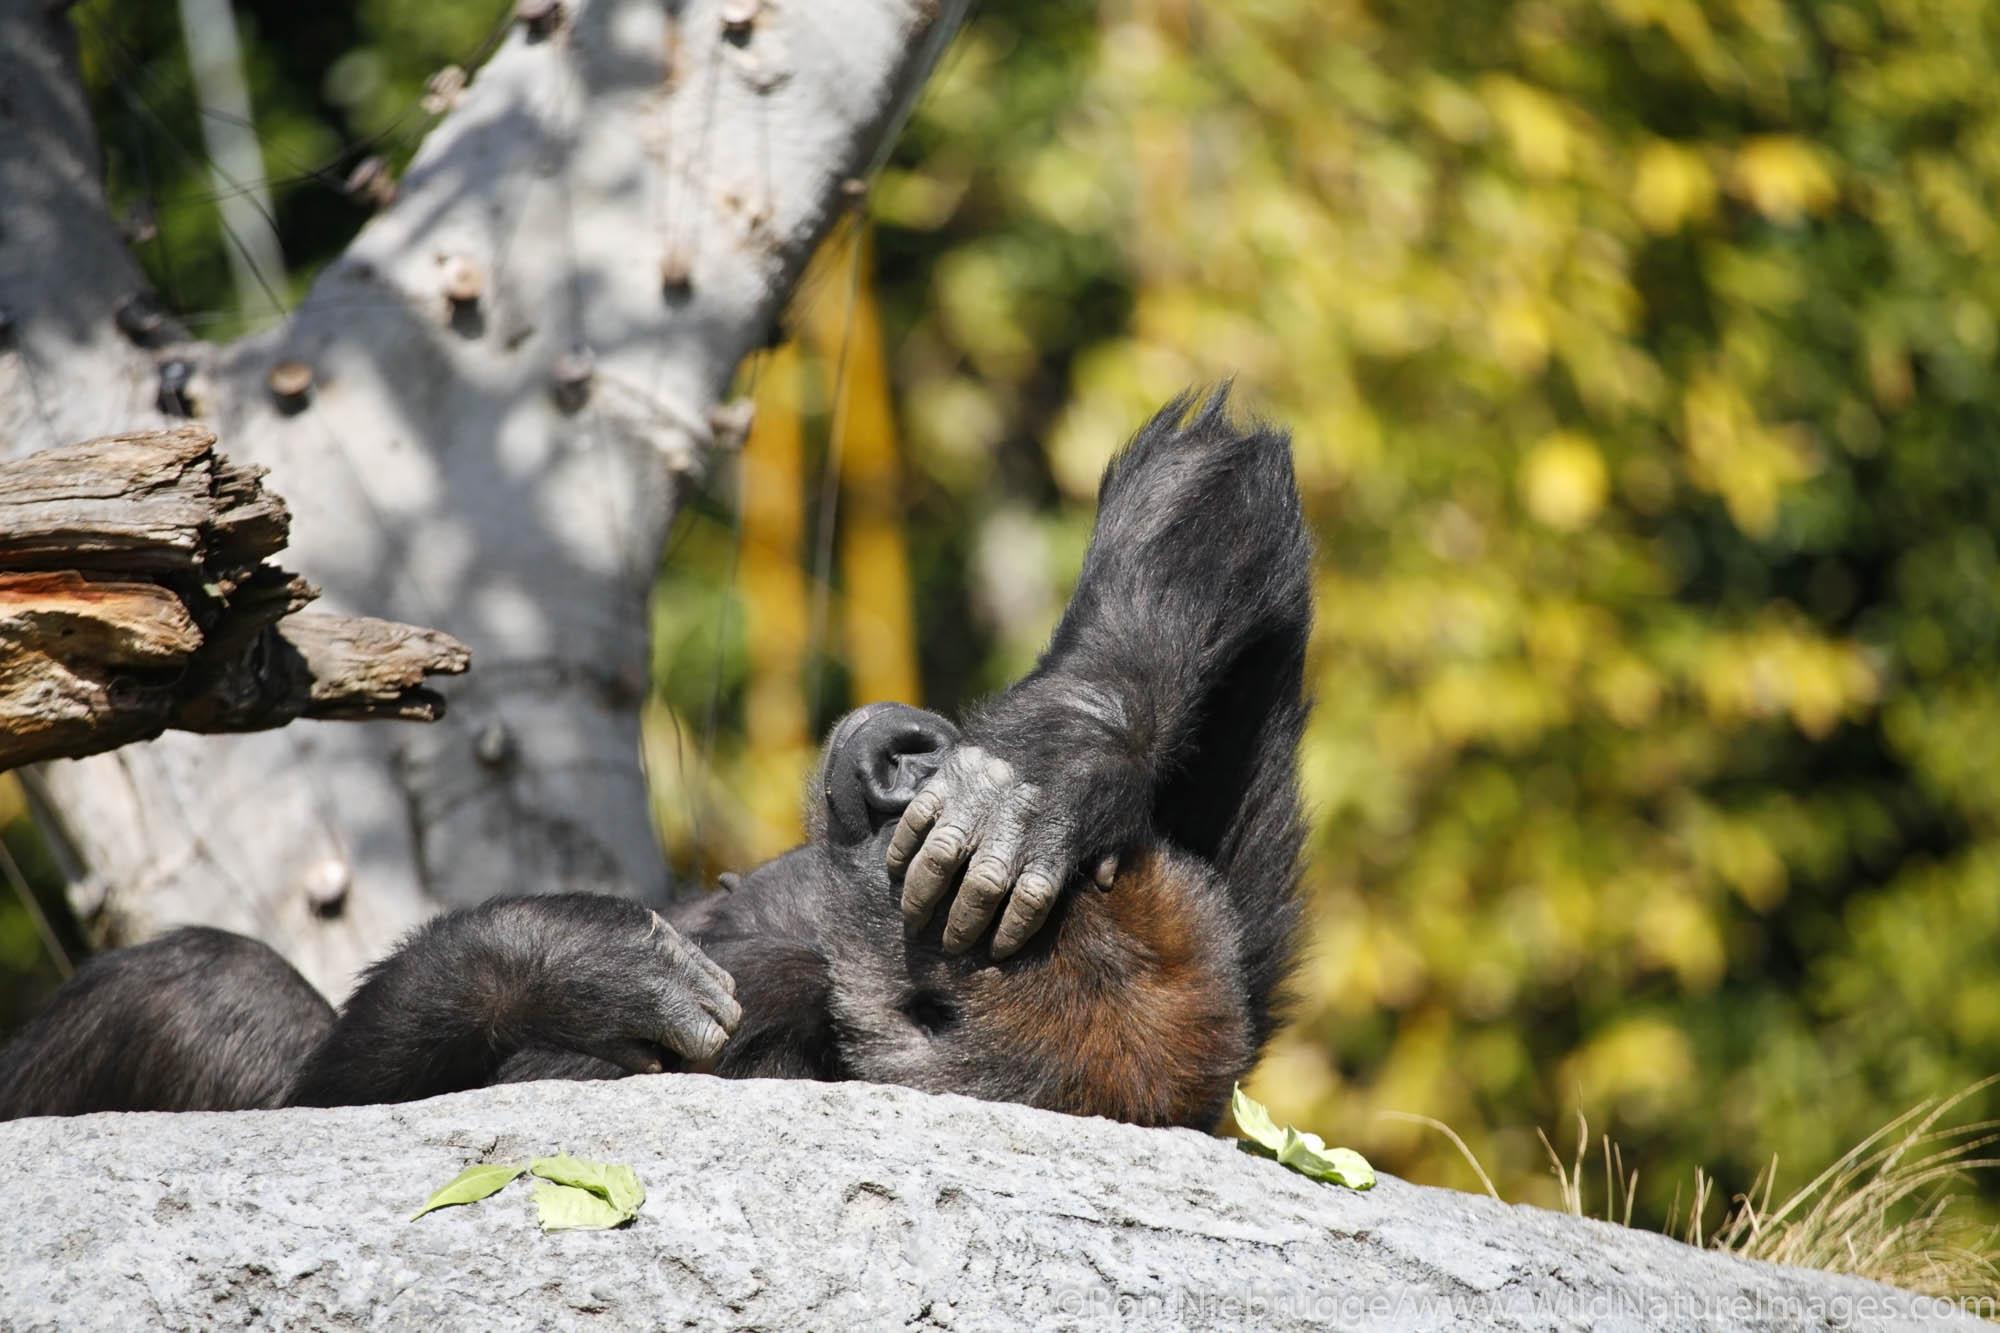 The Gorilla Tropics exhibit at the San Diego Zoo in Balboa Park, San Diego, California.